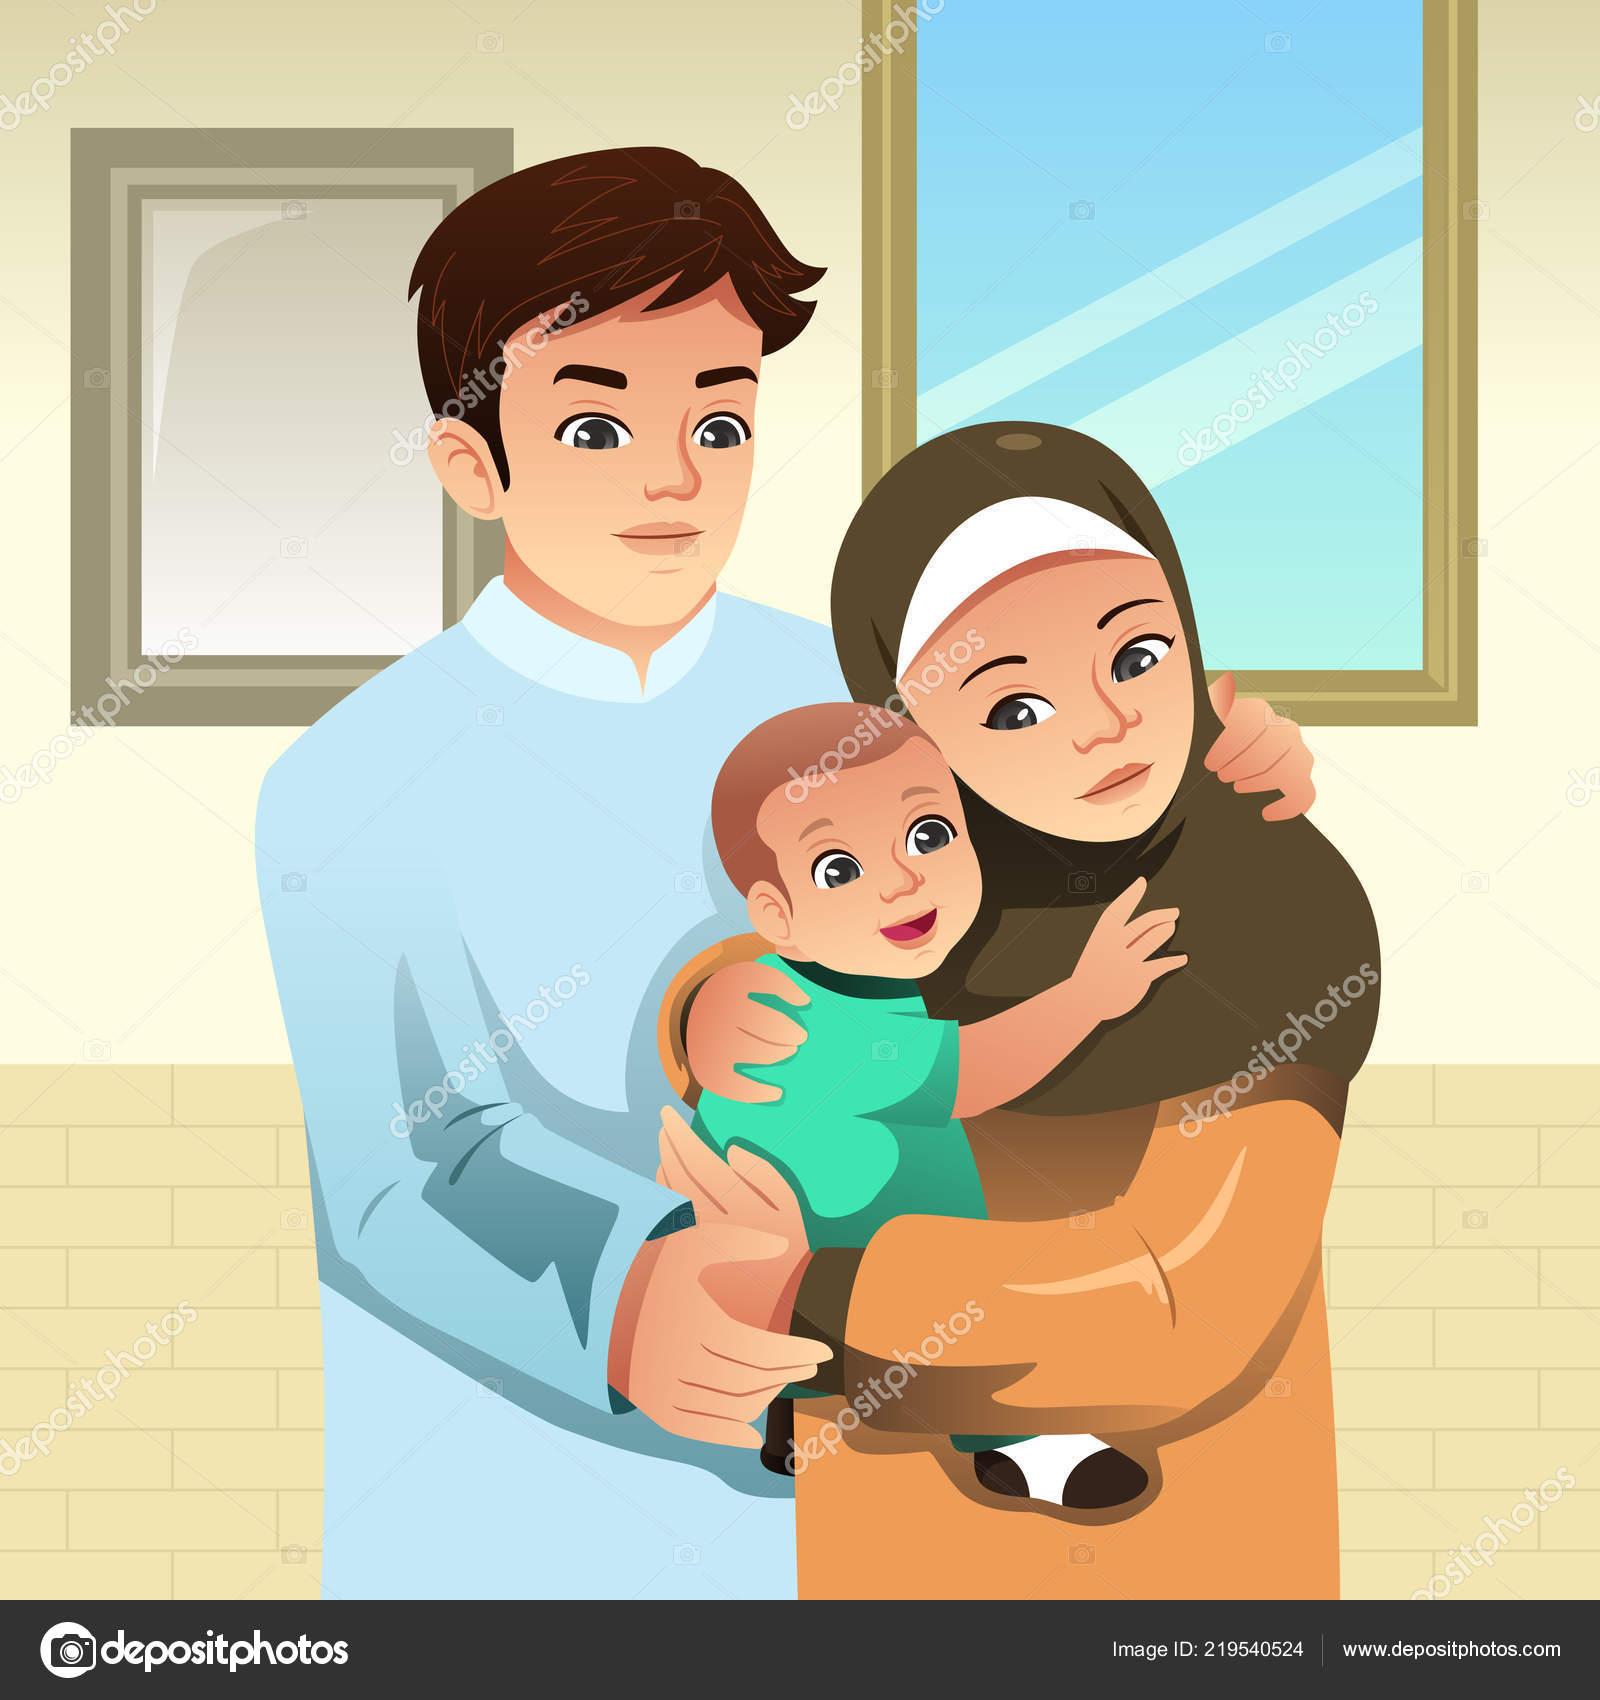 Áˆ Muslim Family Cartoon Stock Vectors Royalty Free Muslim Family Smile Illustrations Download On Depositphotos